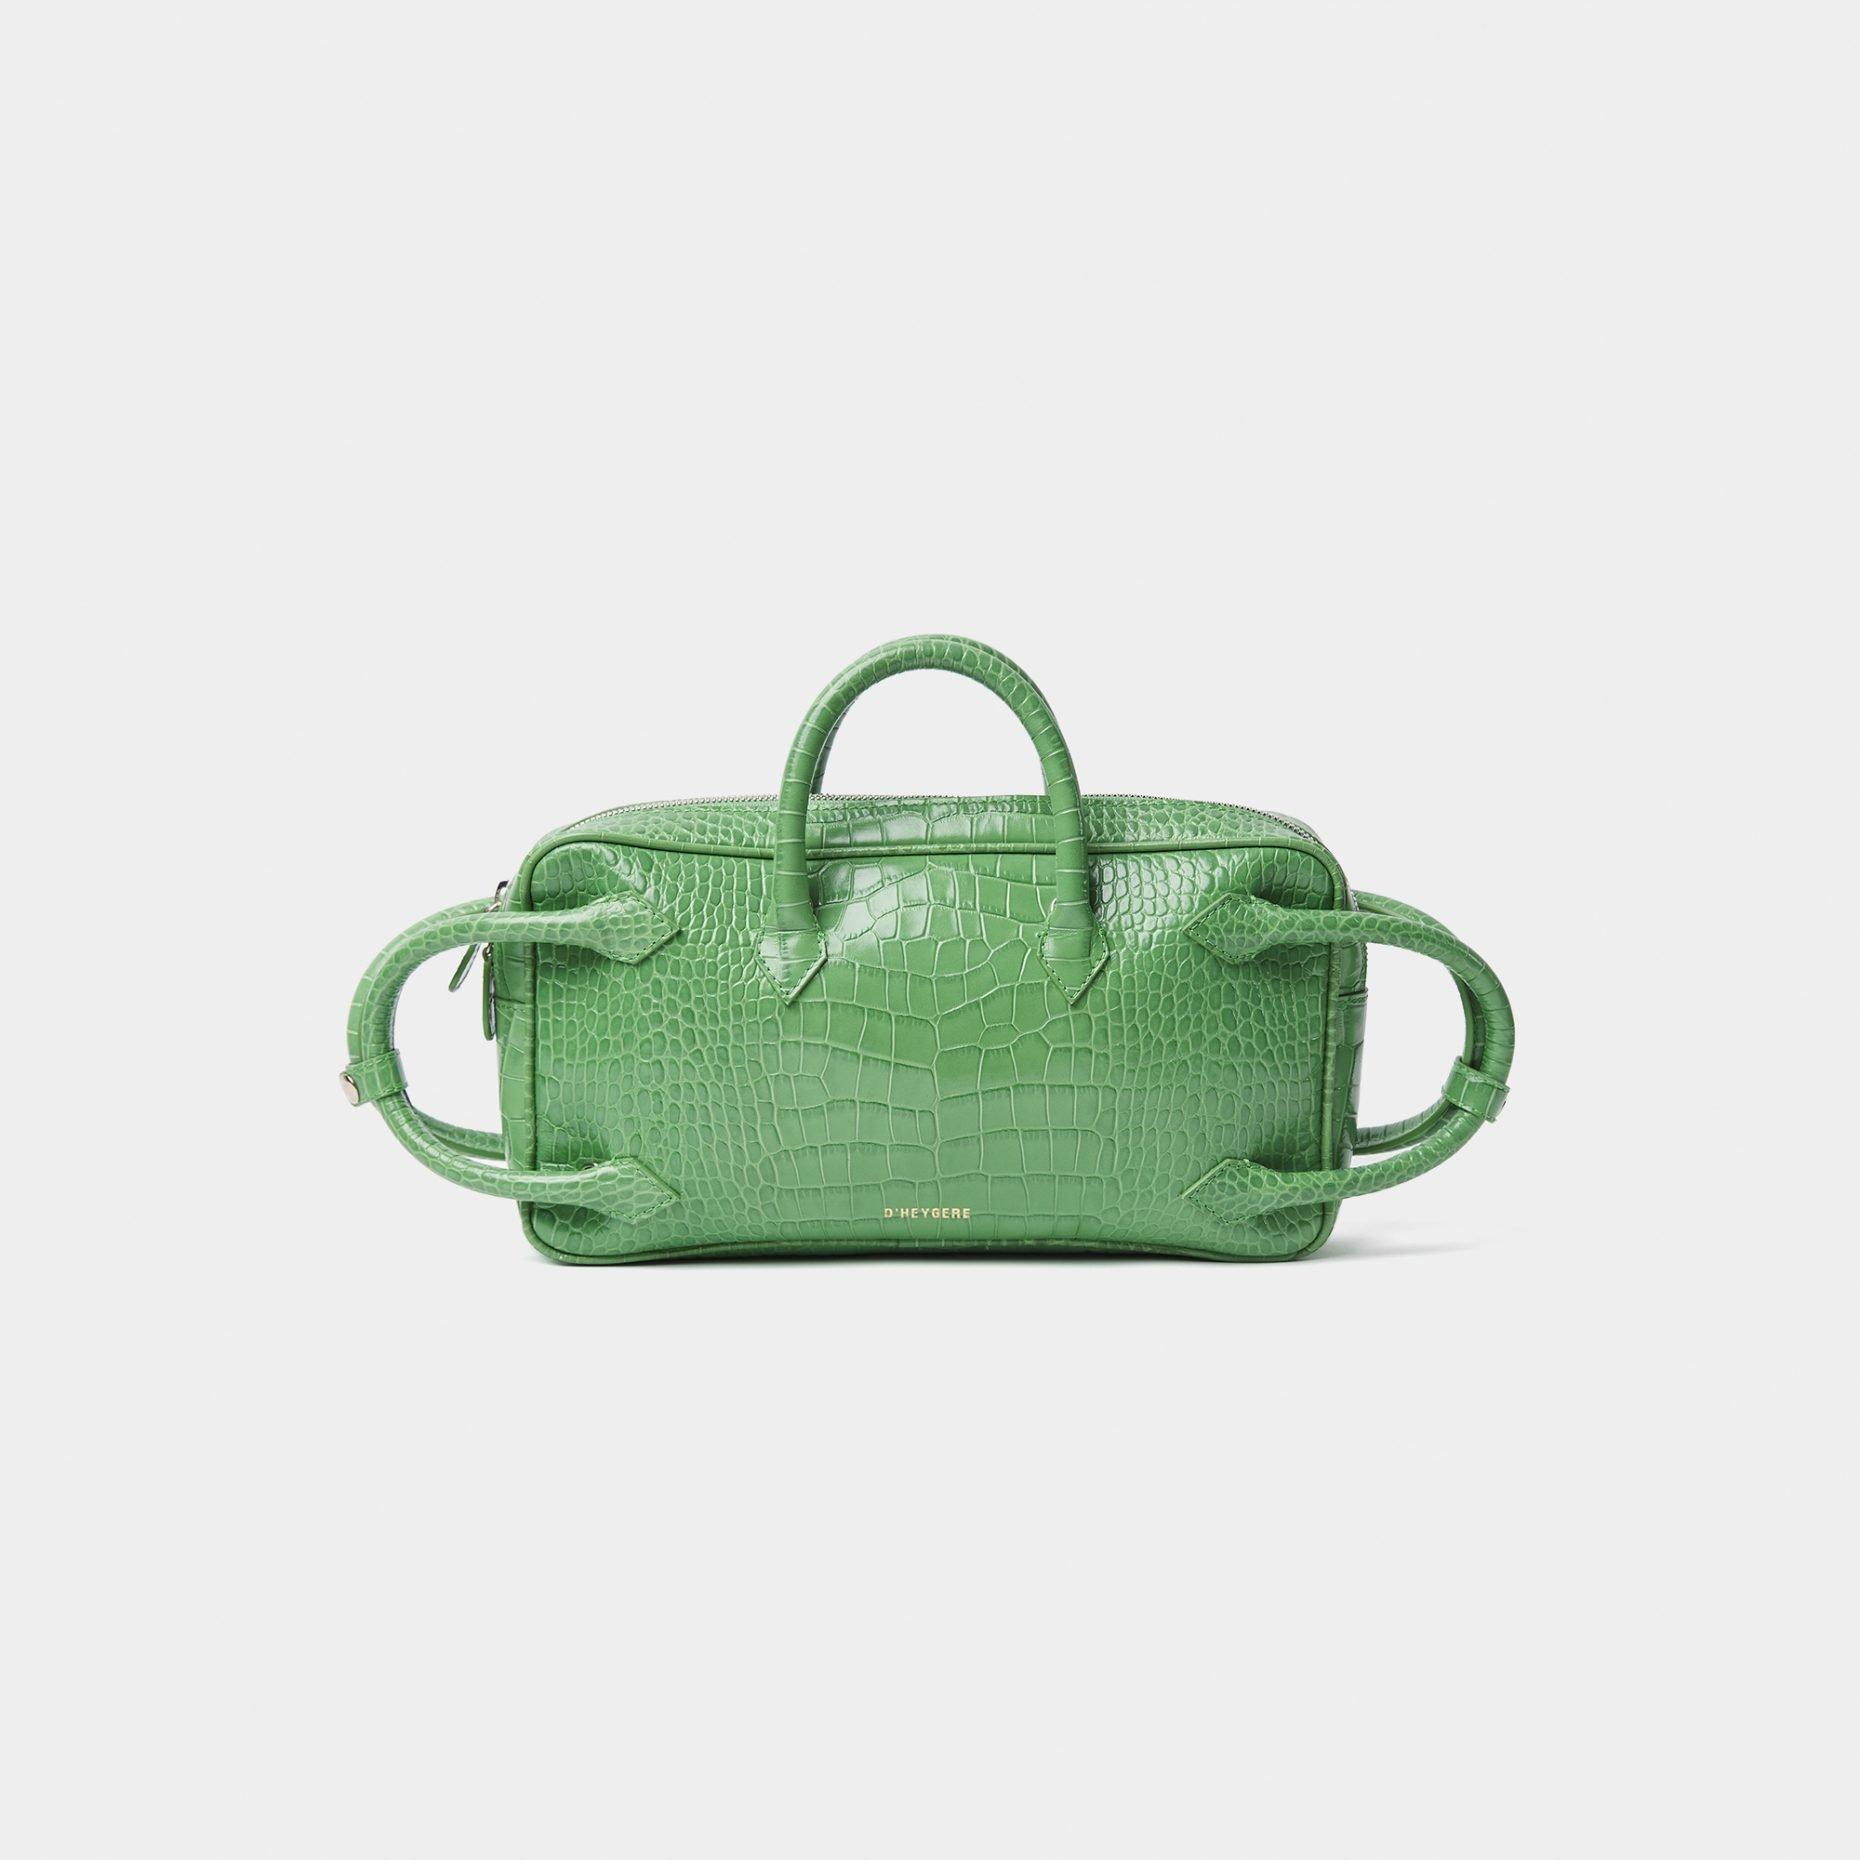 D'heygere Twister Bag